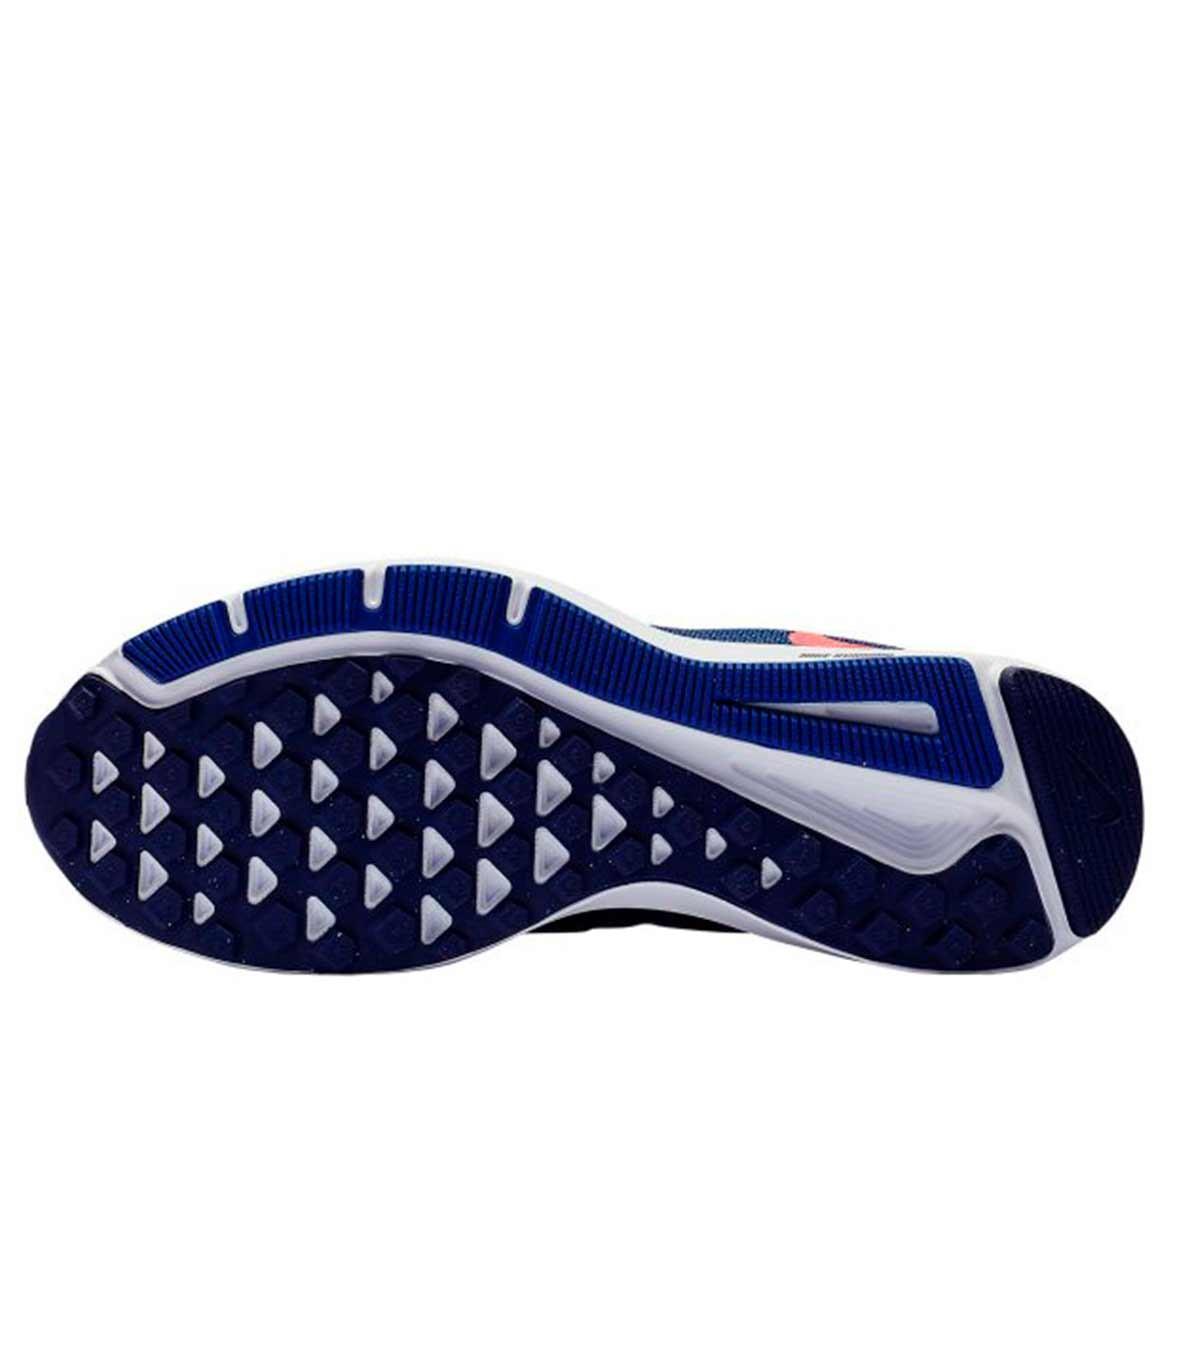 quality design 51c69 80d5a Zapatilla Nike Quest